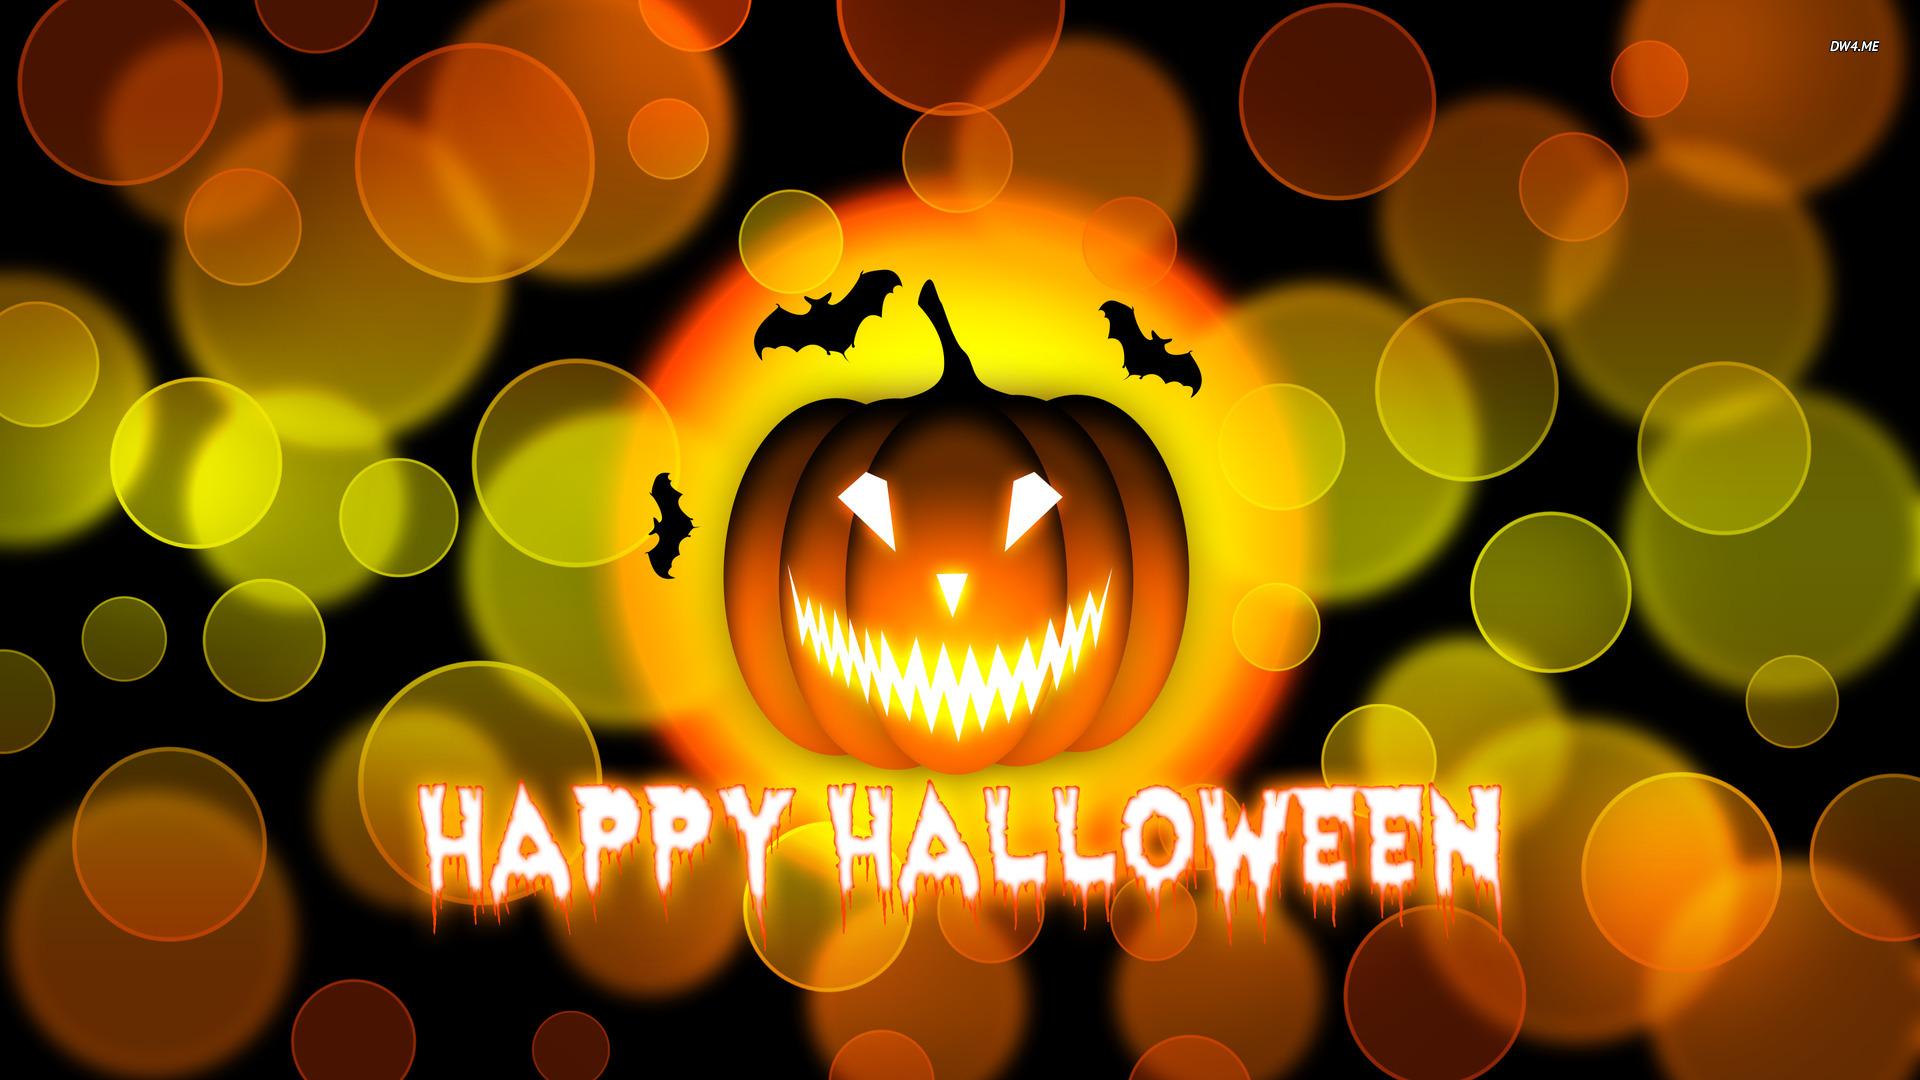 Download Cute Halloween Background Hd Wallpaper For Desktop 1920x1080